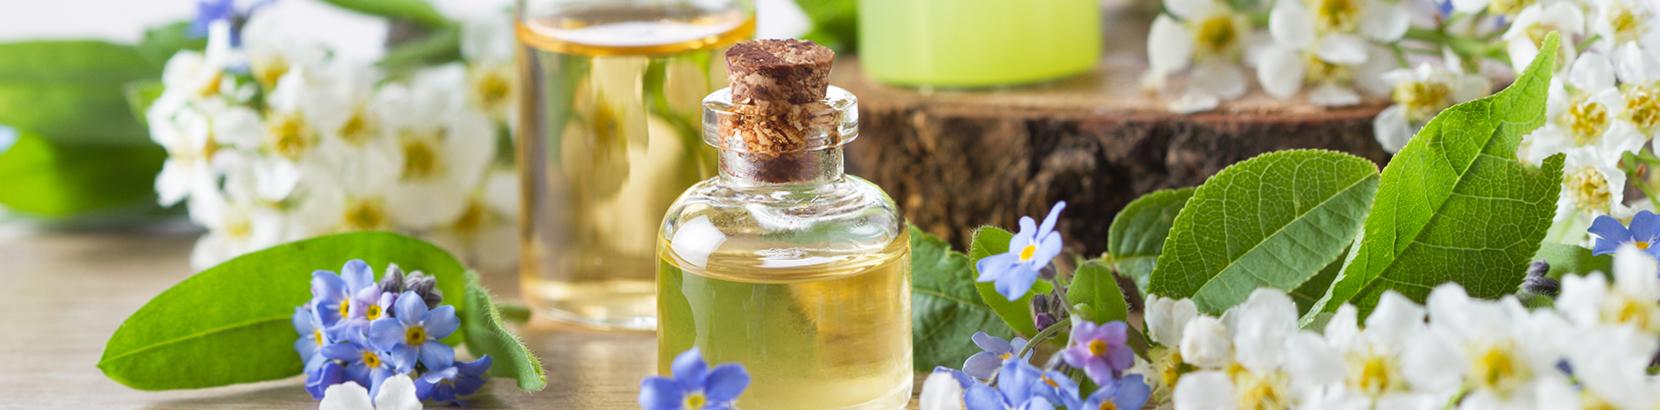 website_grid_1660x410_aromatherapy